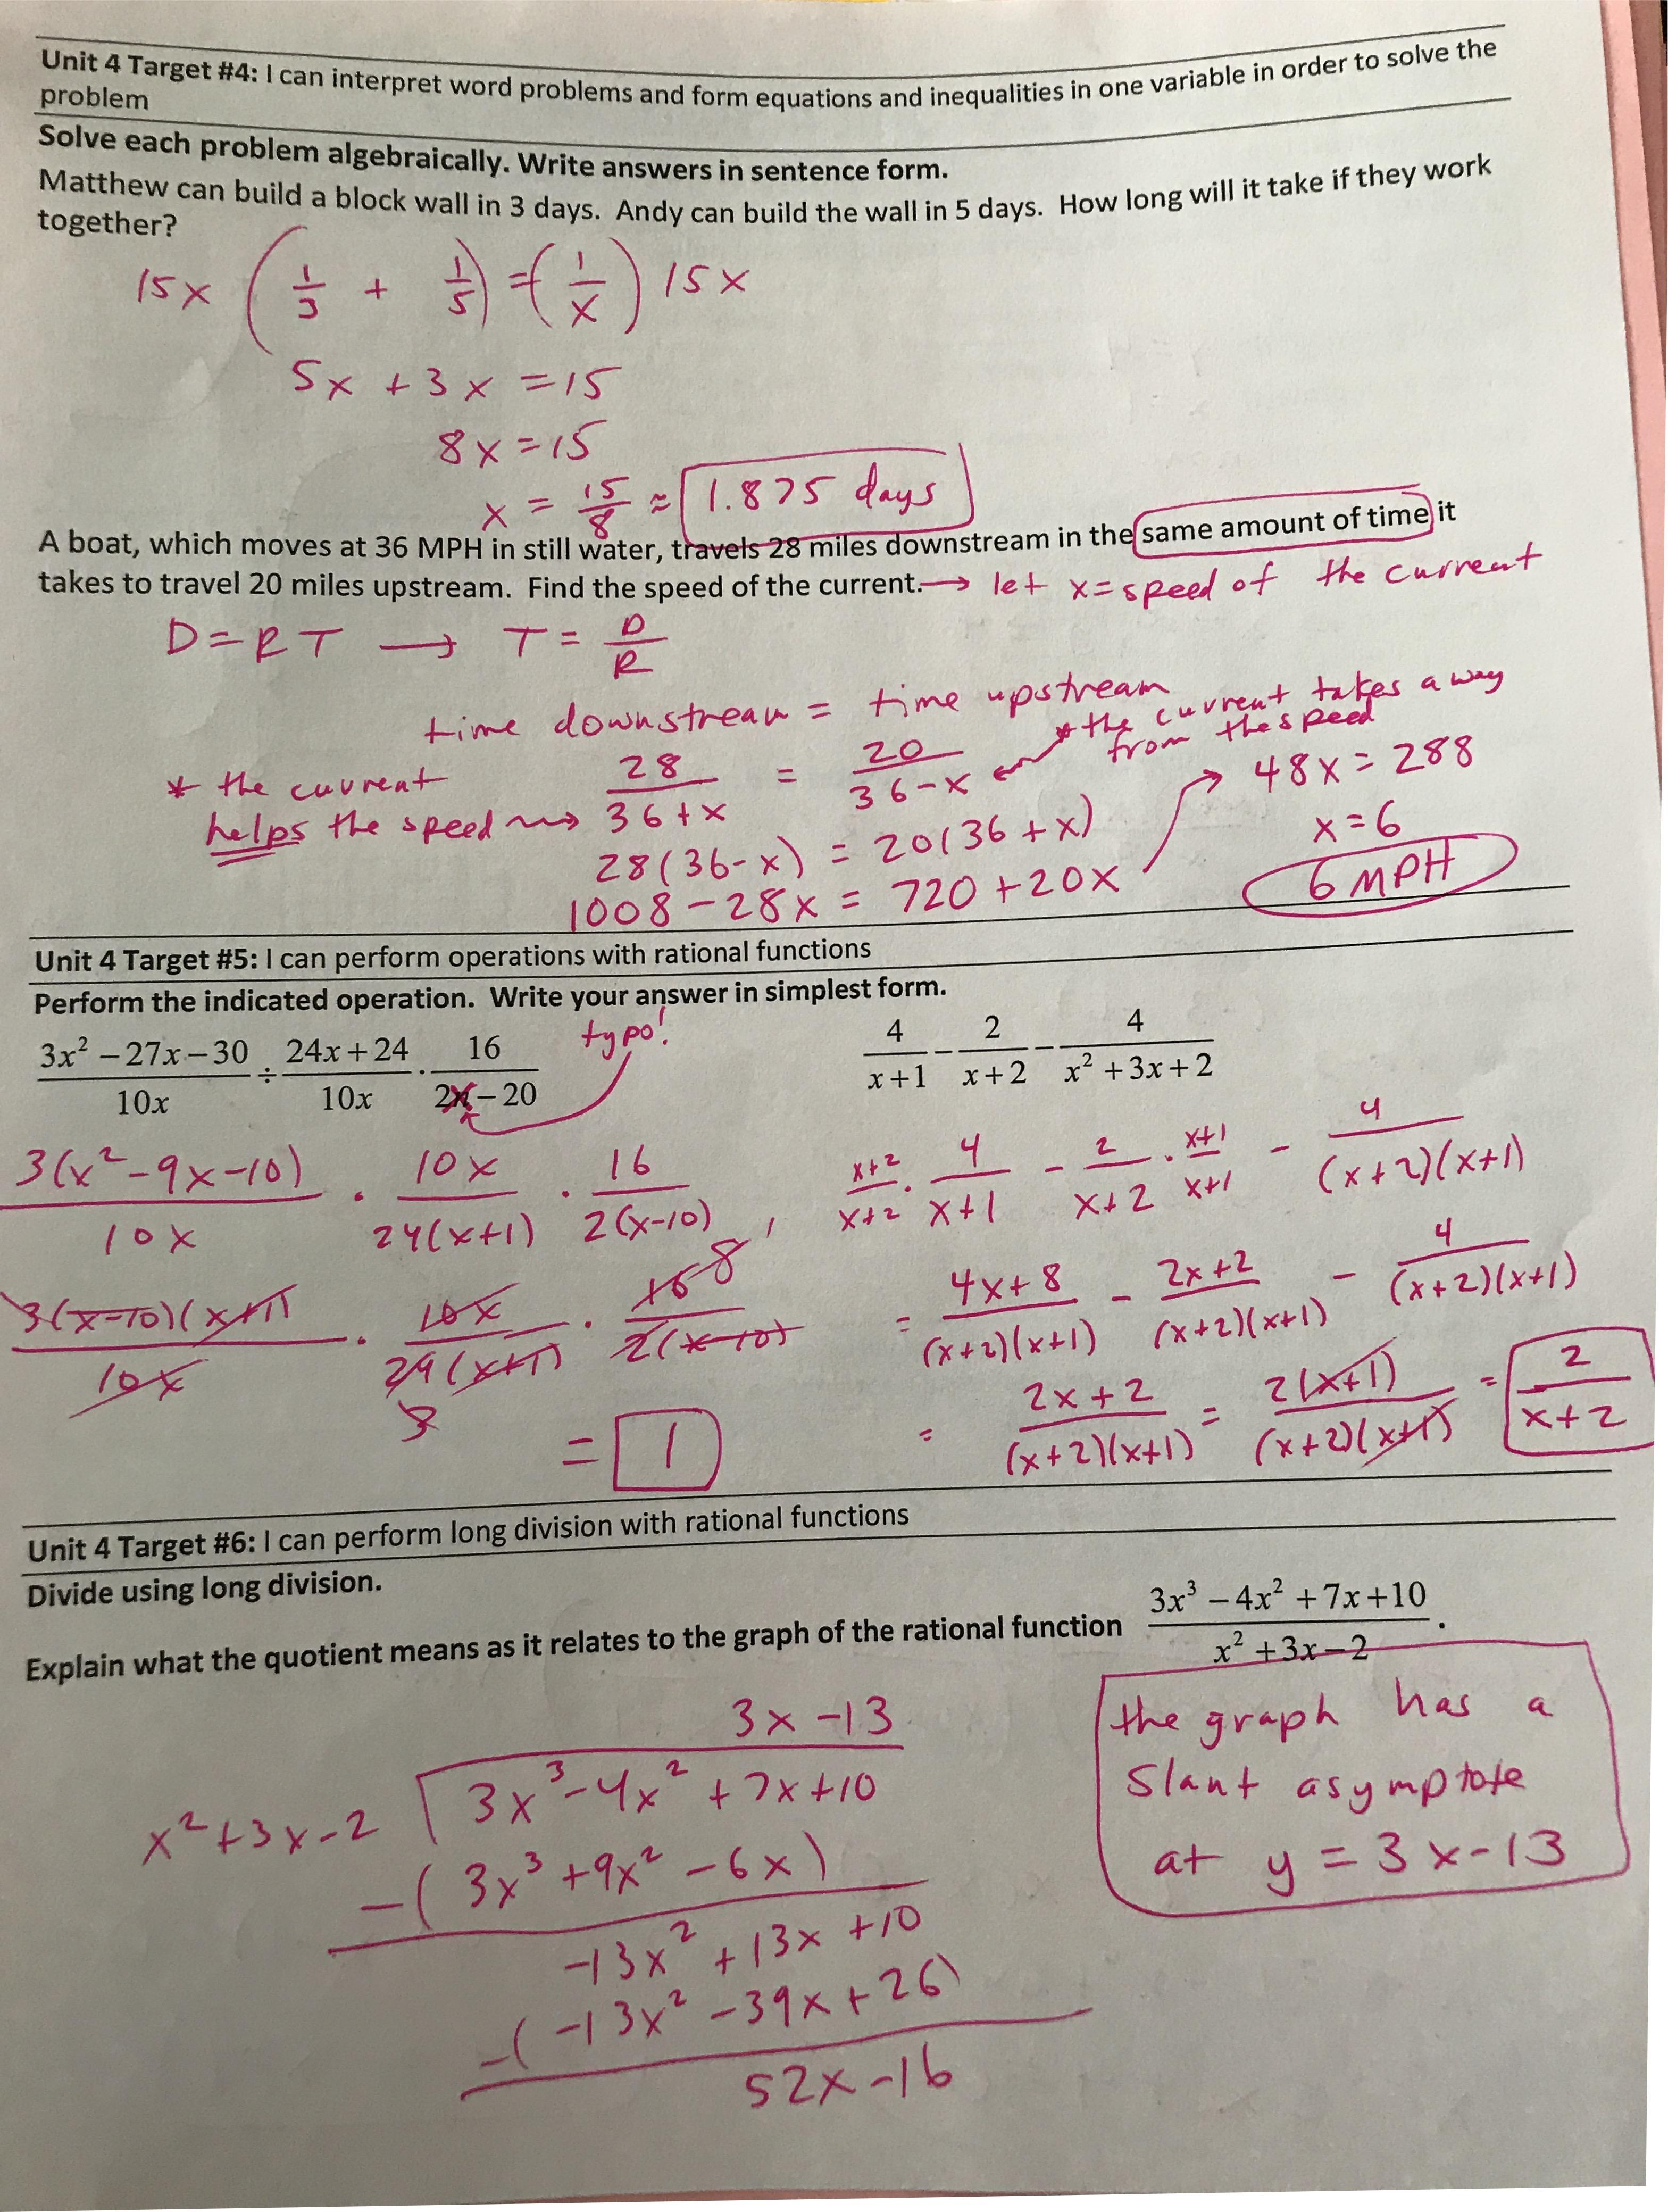 Schermann, April / Honors Algebra 2